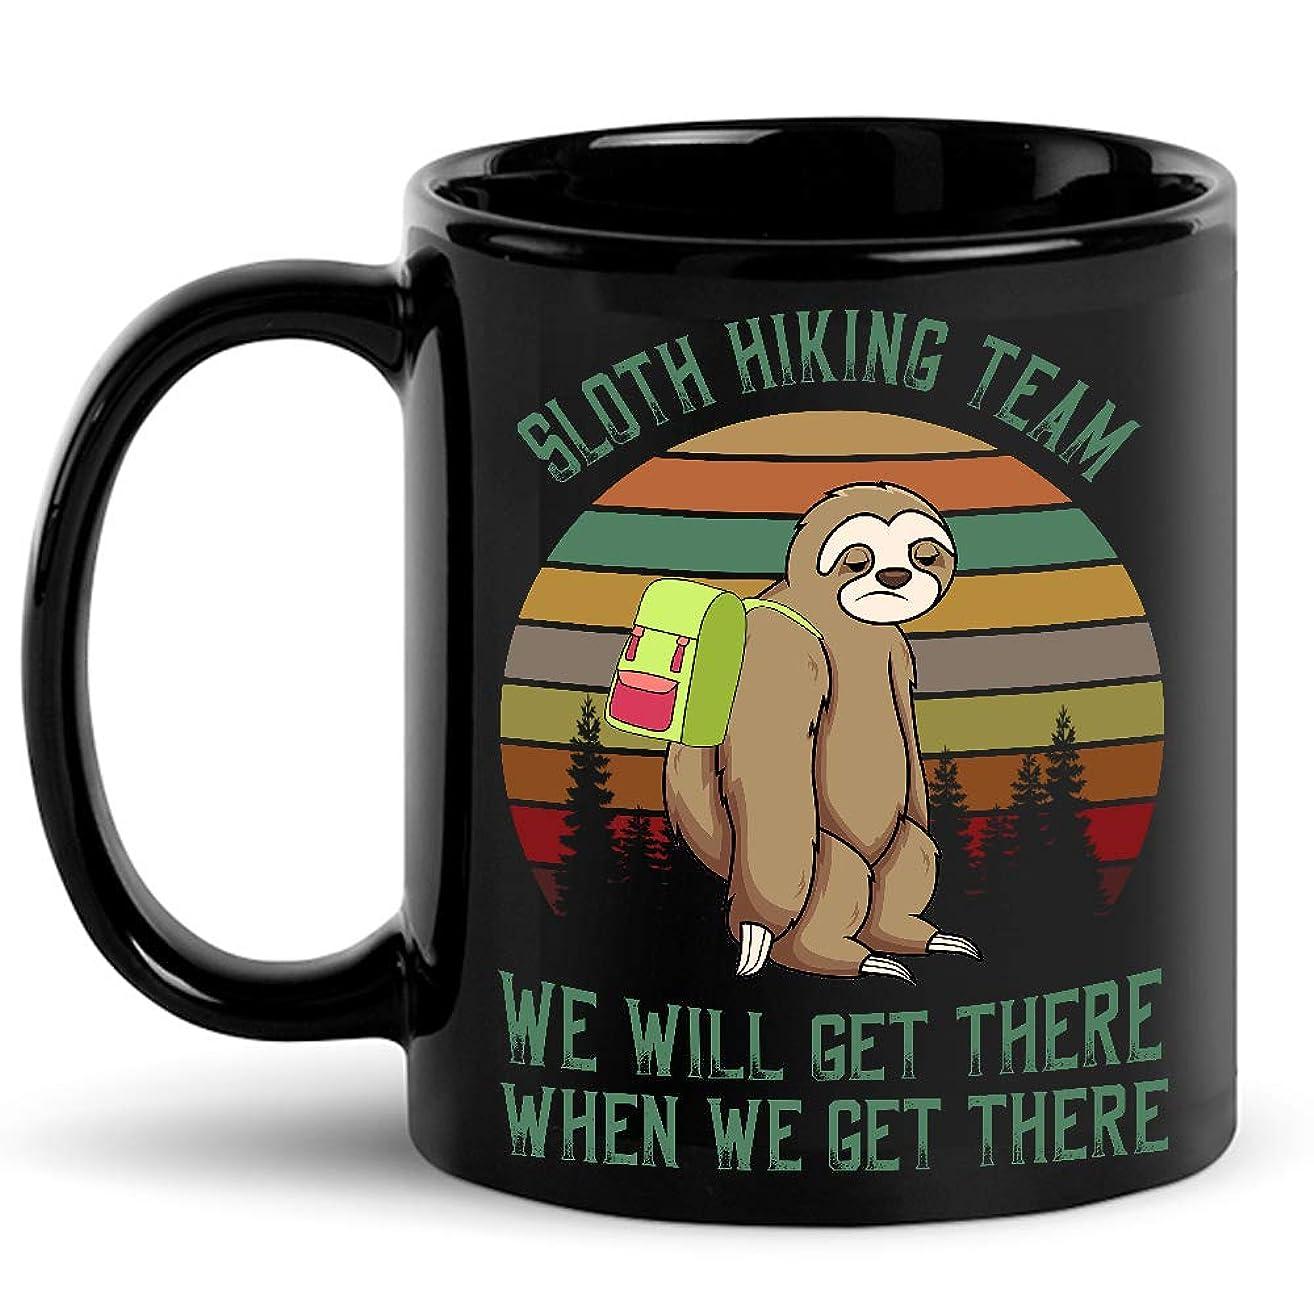 Funny Sloth Hiking Team Coffee Mug We Will Get There When We Get There Vintage Mug Hiking Lover Mugs Humorous Sarcastic Cozy Novelty Coffee Mug Tea Cup Gift 11oz 15oz Black Ceramic Mug